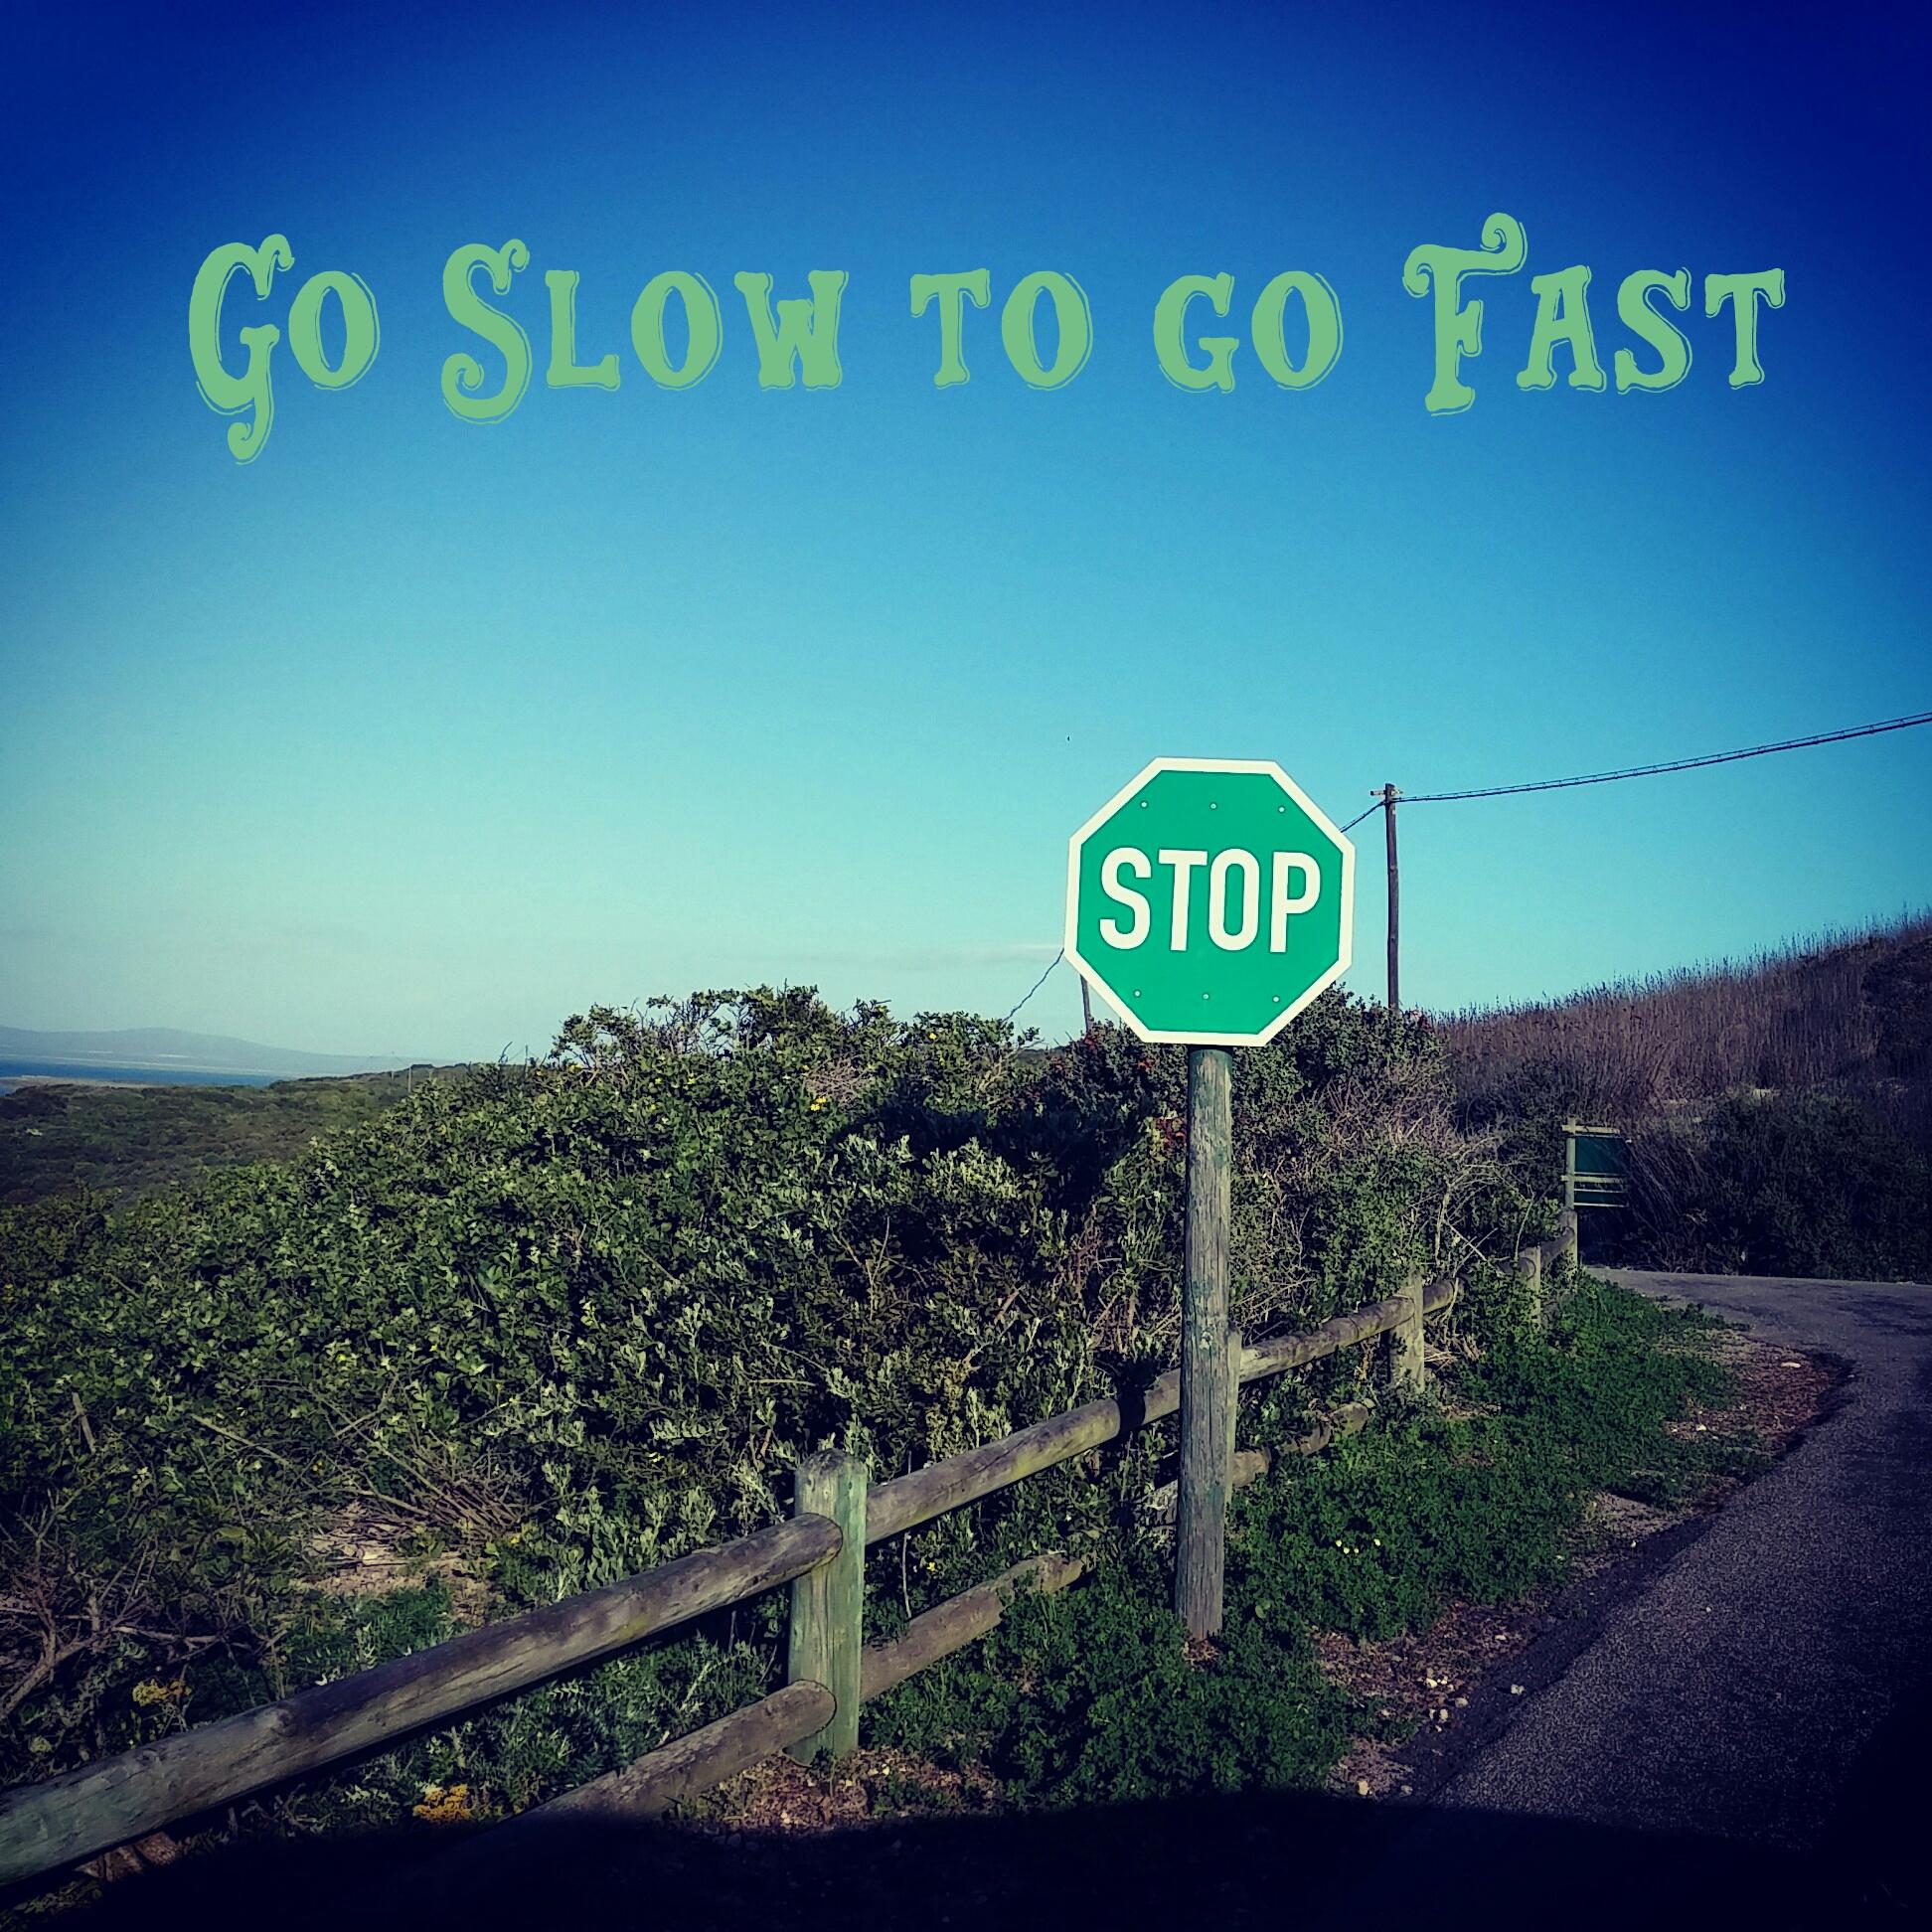 Slow signpost